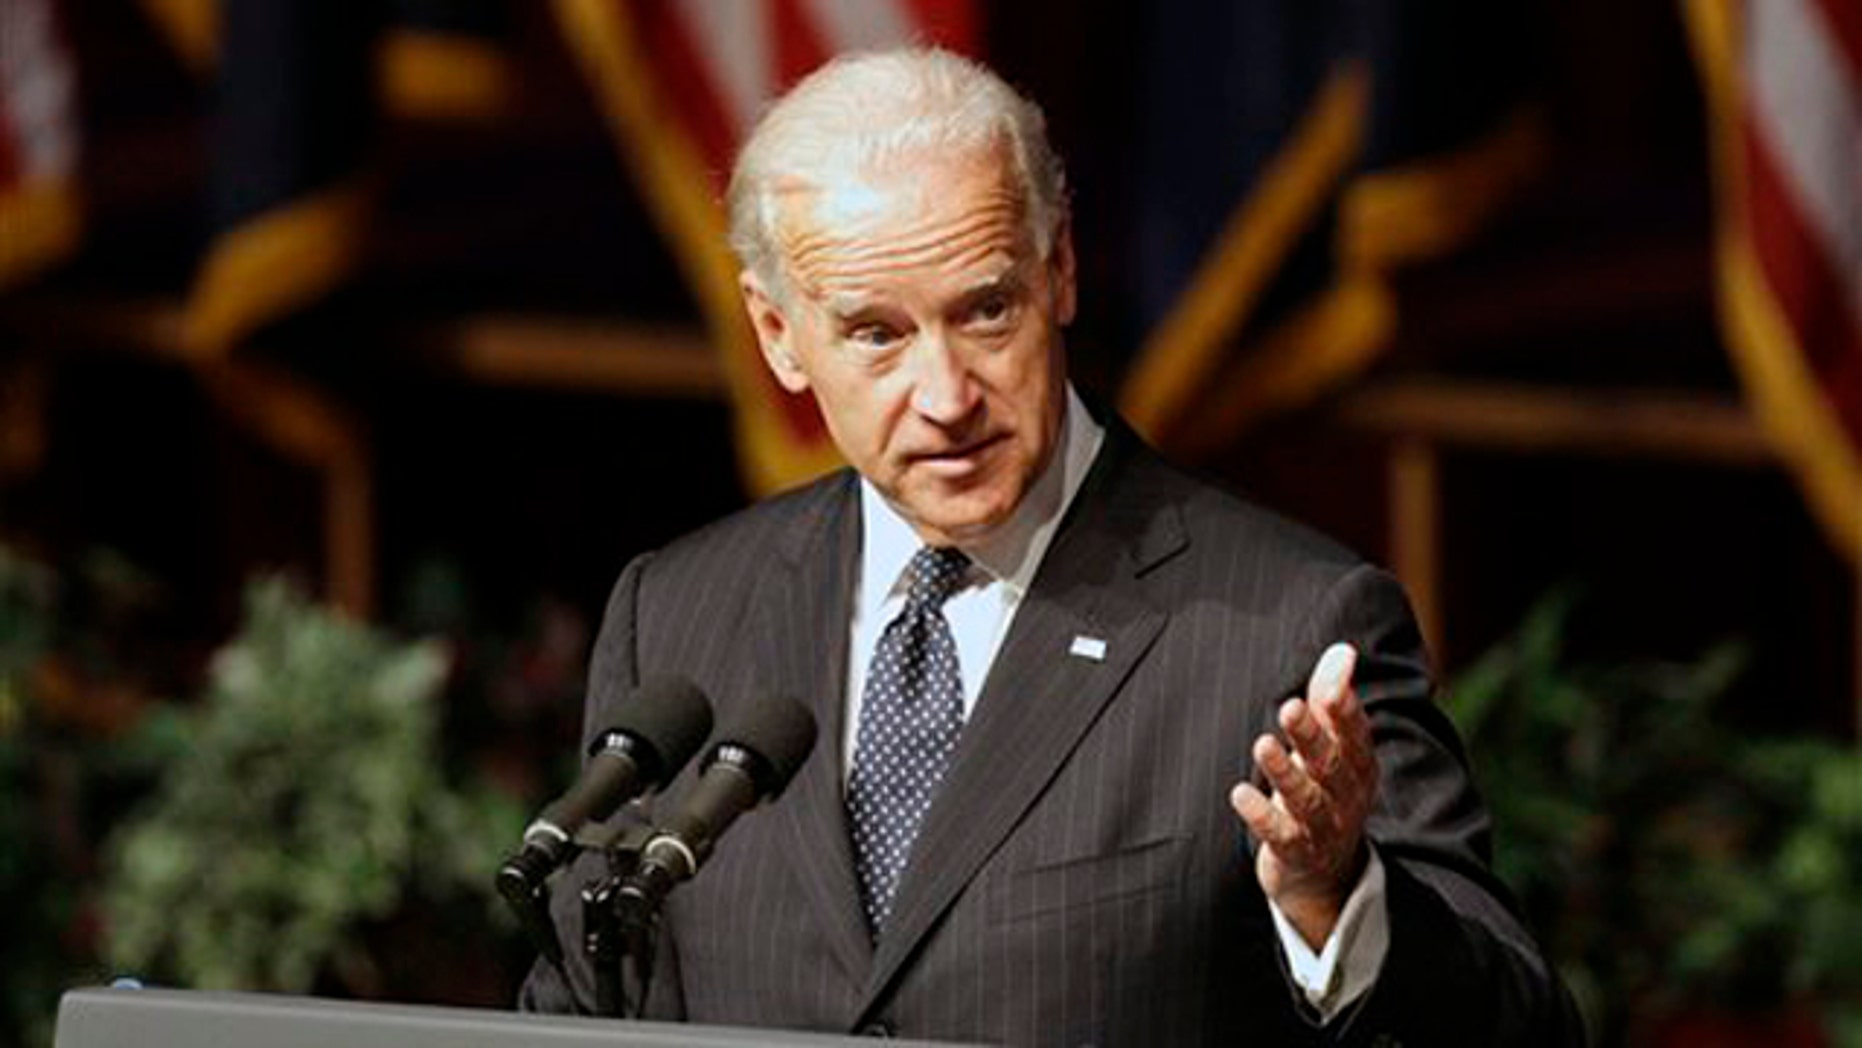 Vice President Joe Biden is shown speaking during funeral services for former U.S. Sen. Ted Stevens  Aug. 18 in Anchorage, Alaska. (AP Photo)